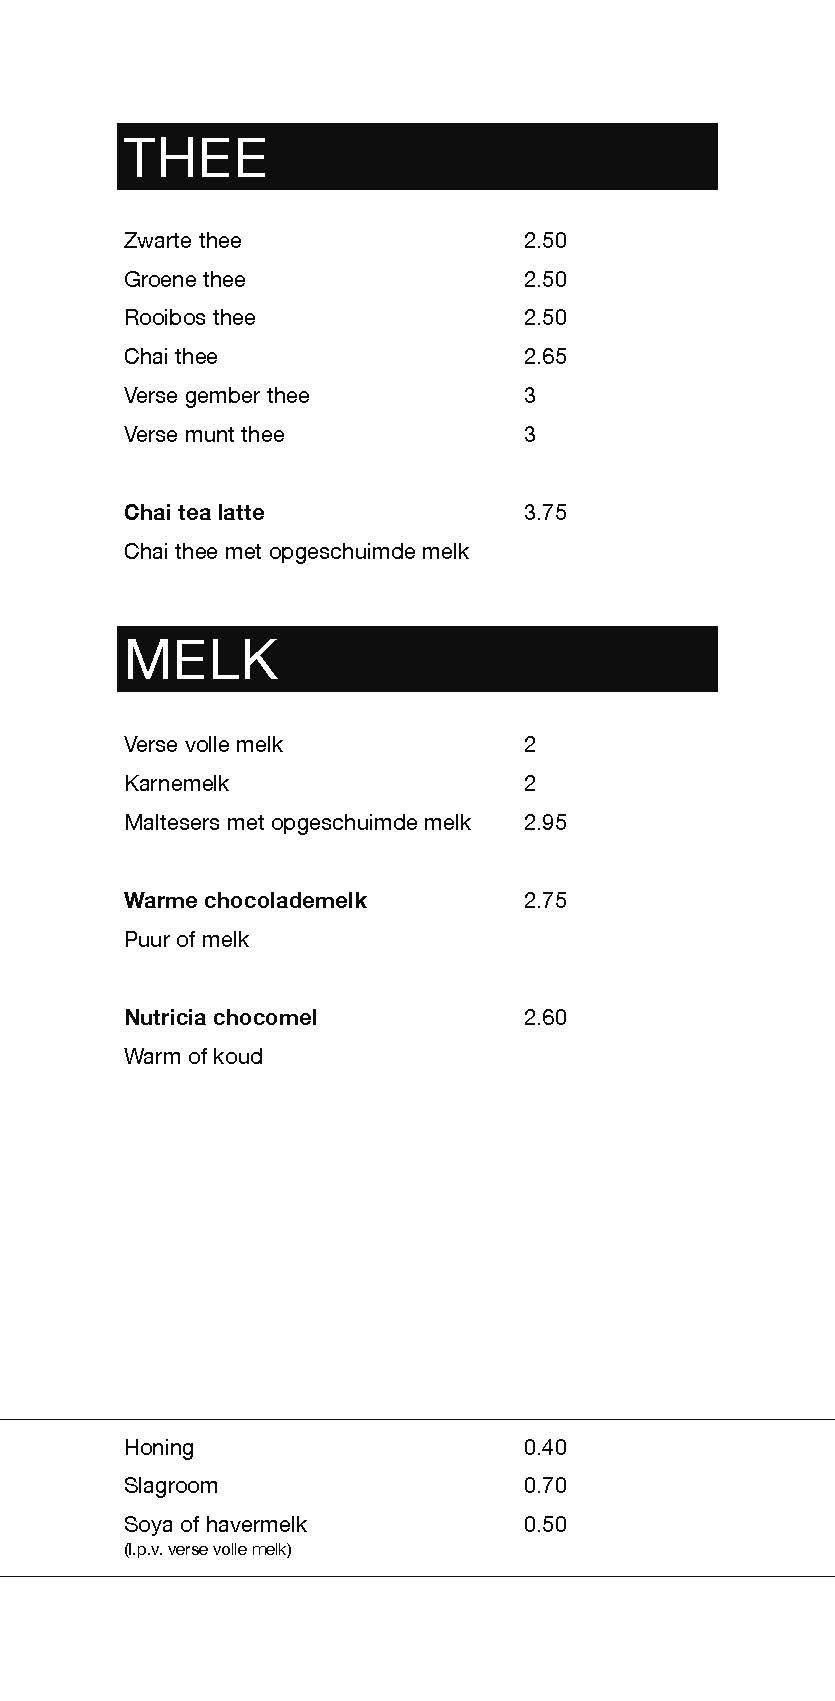 menukaart 2020 drukgereed losse pagines_Pagina_3